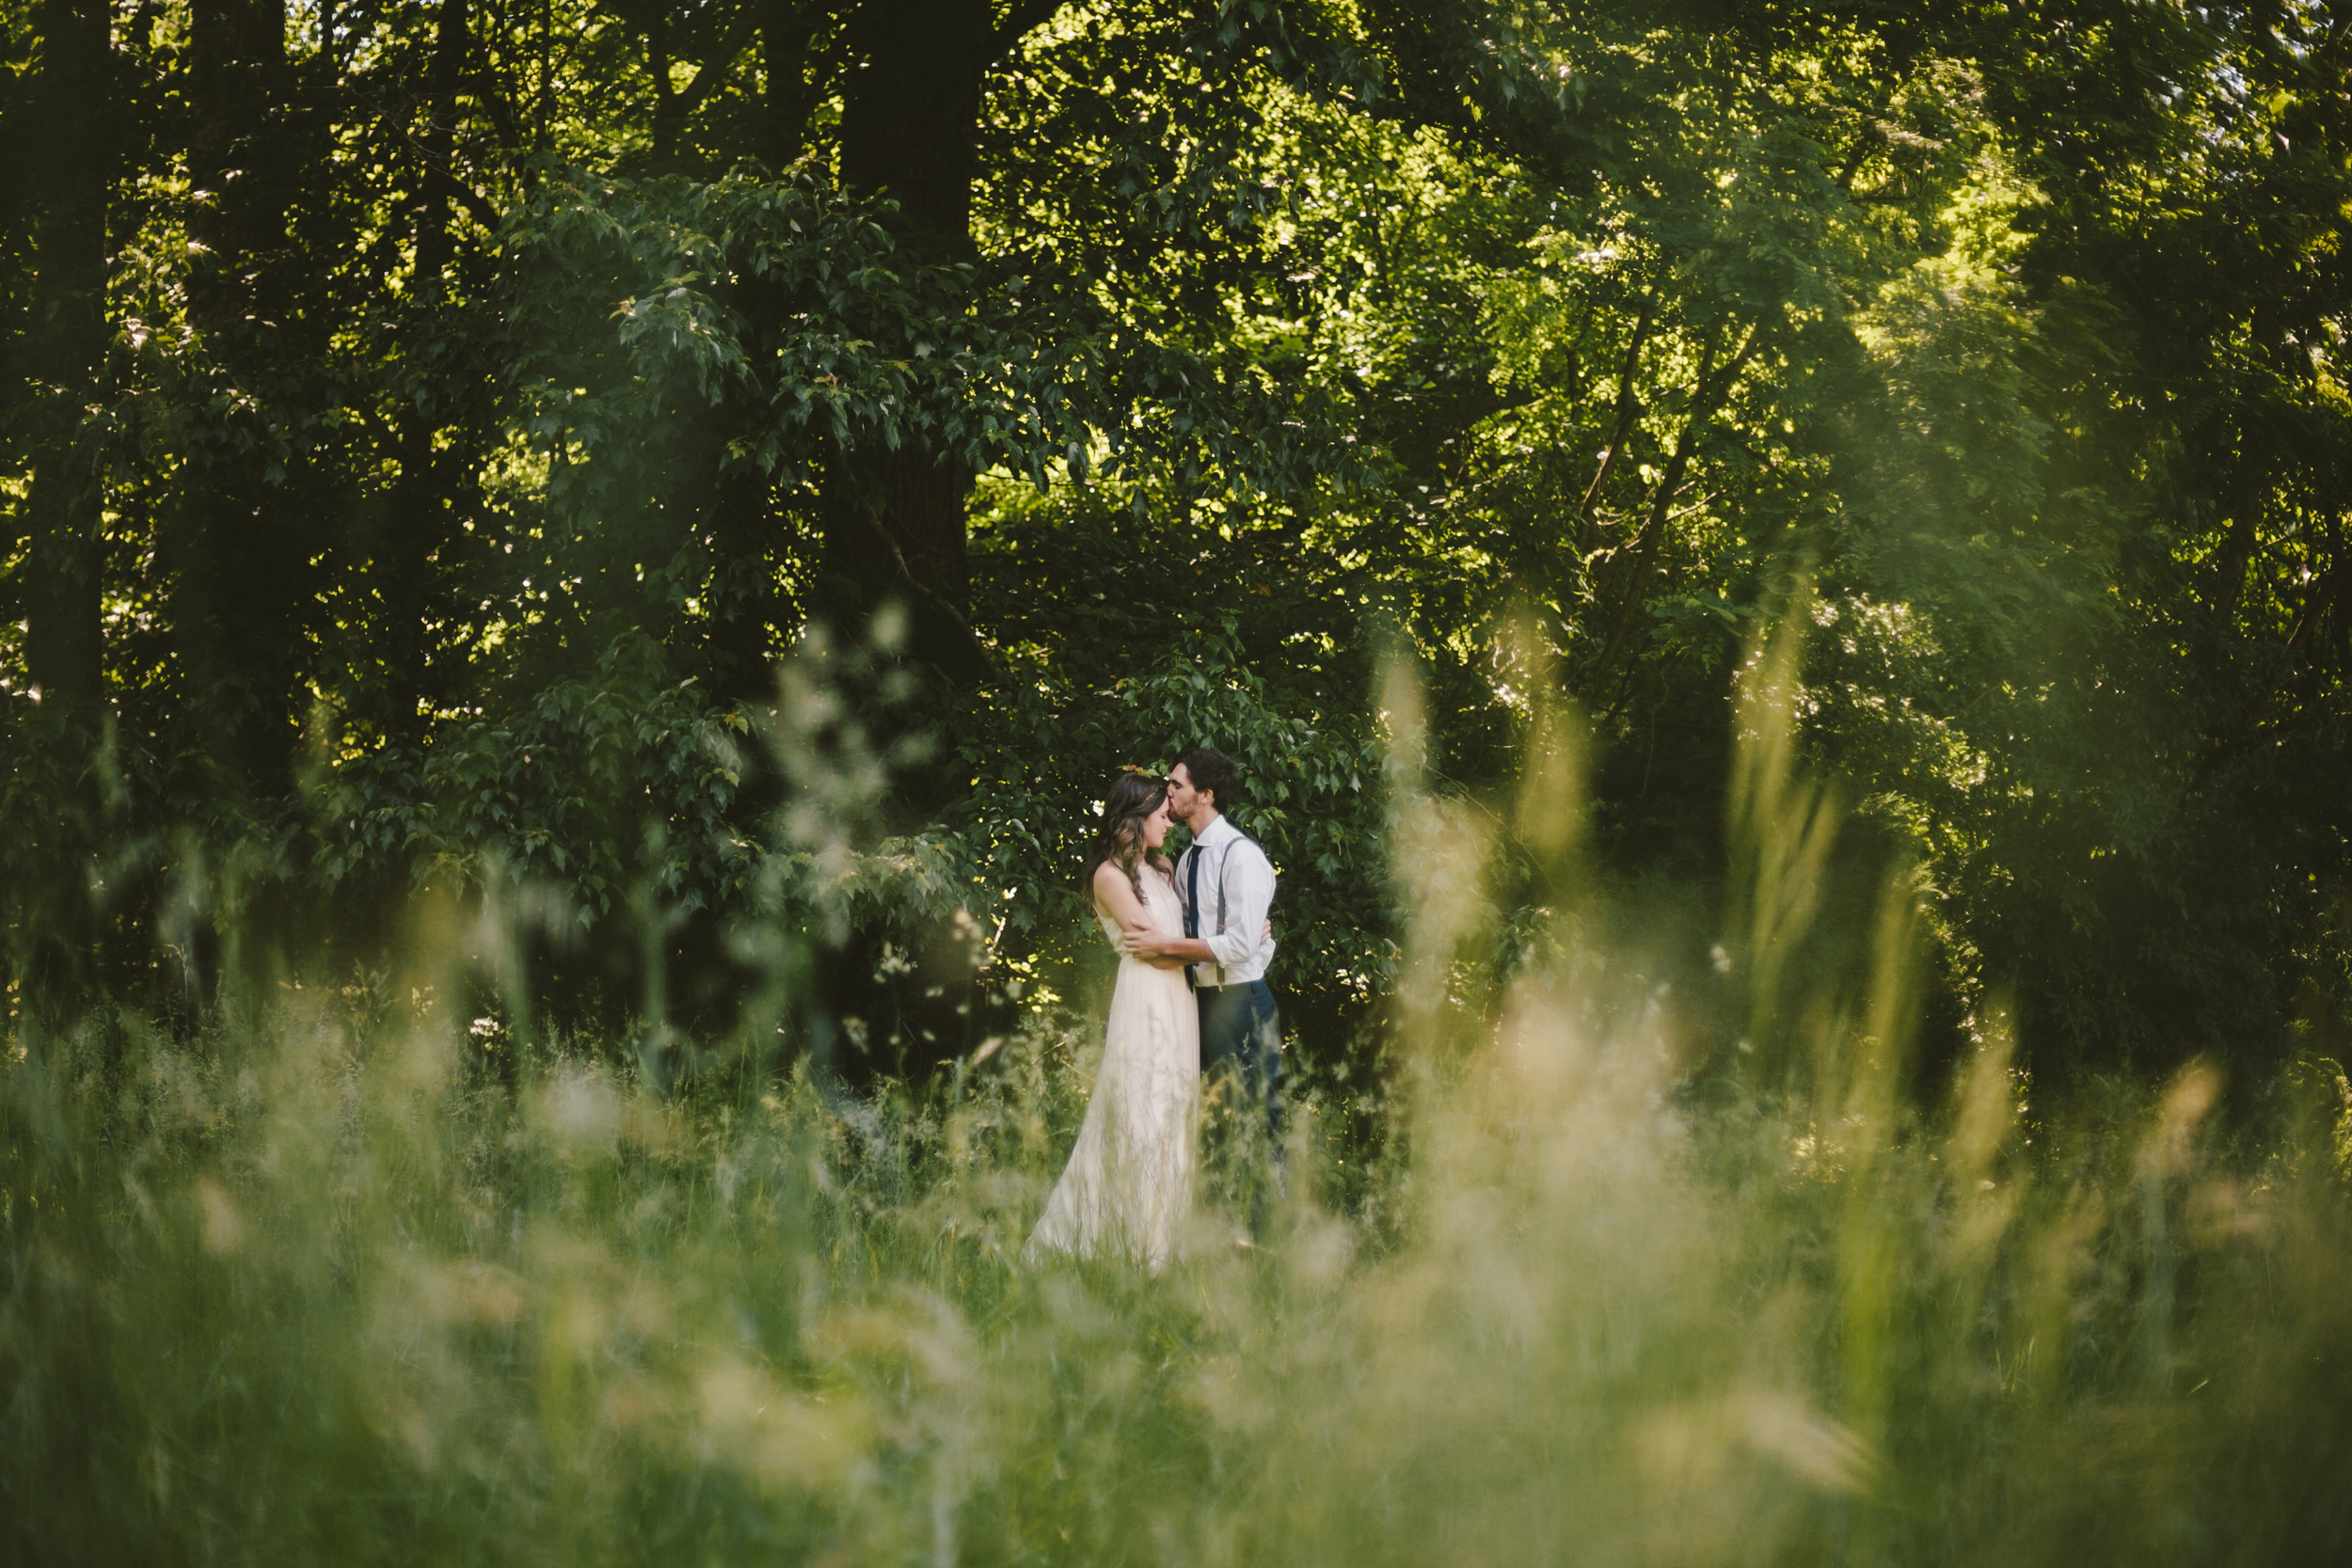 Zack + Hannah Millsaps Wedding in Greenville SC Nashville Wedding Photographer Photography Anthology-11.jpg